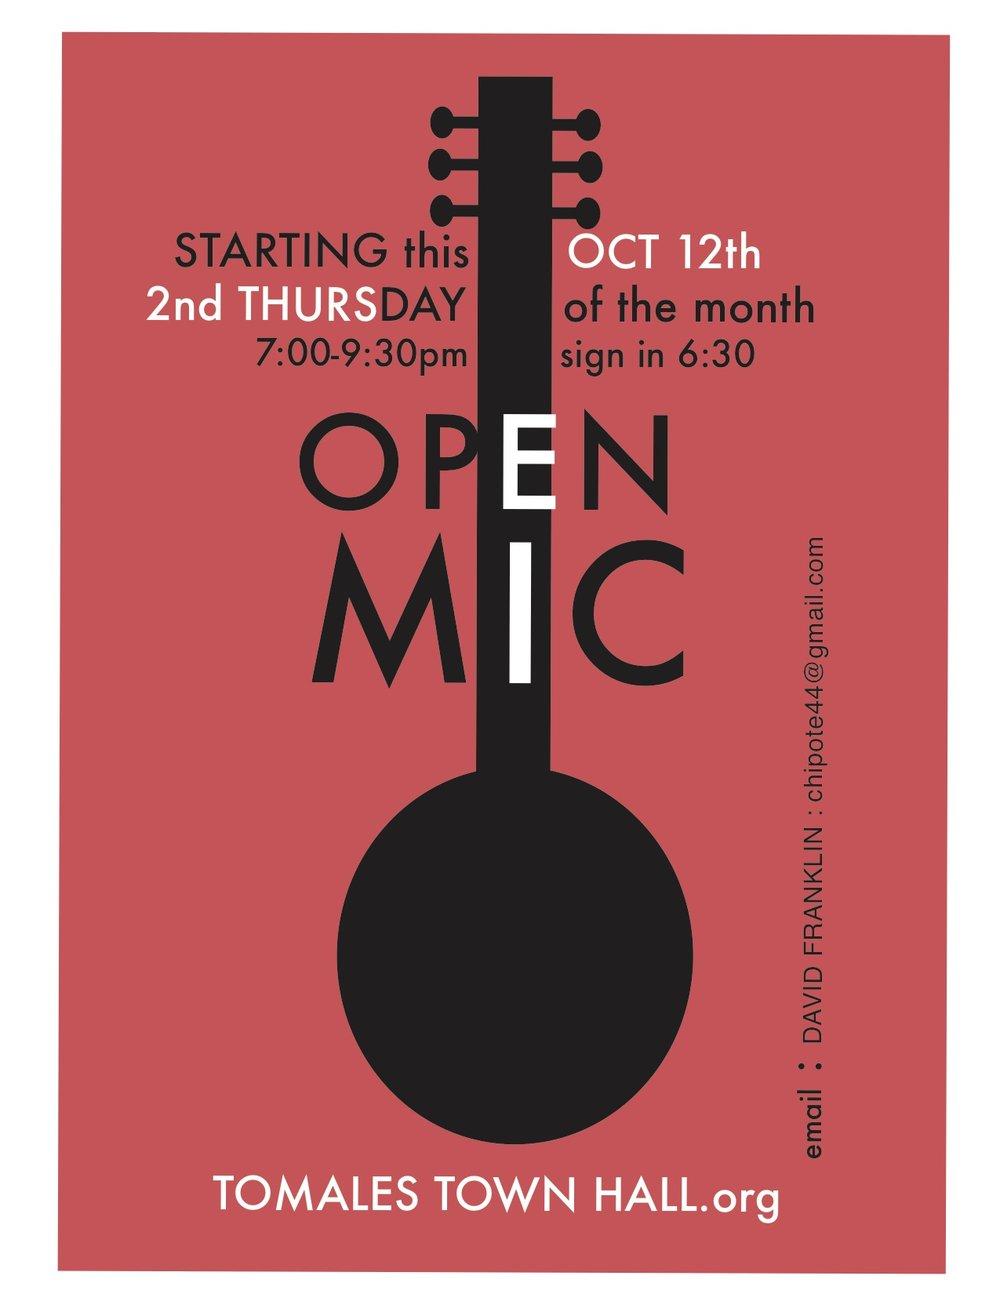 openmic-oct-12-start.jpg